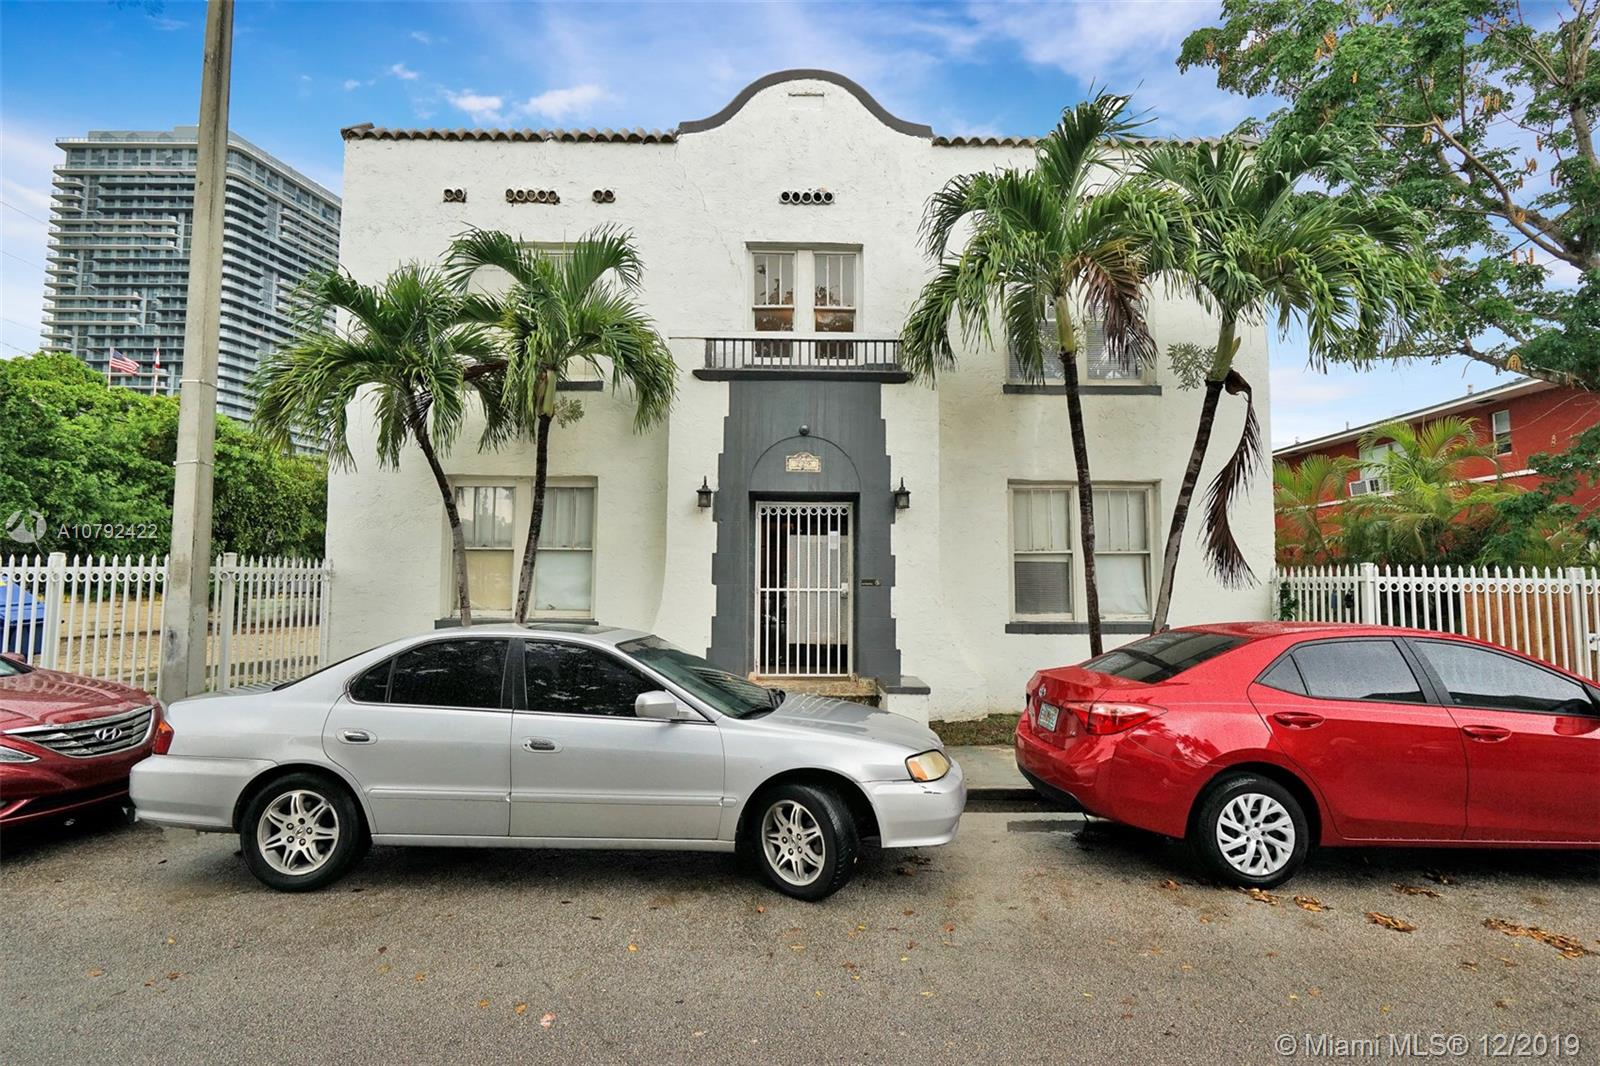 229 NE 32 STREET #3 For Sale A10792422, FL